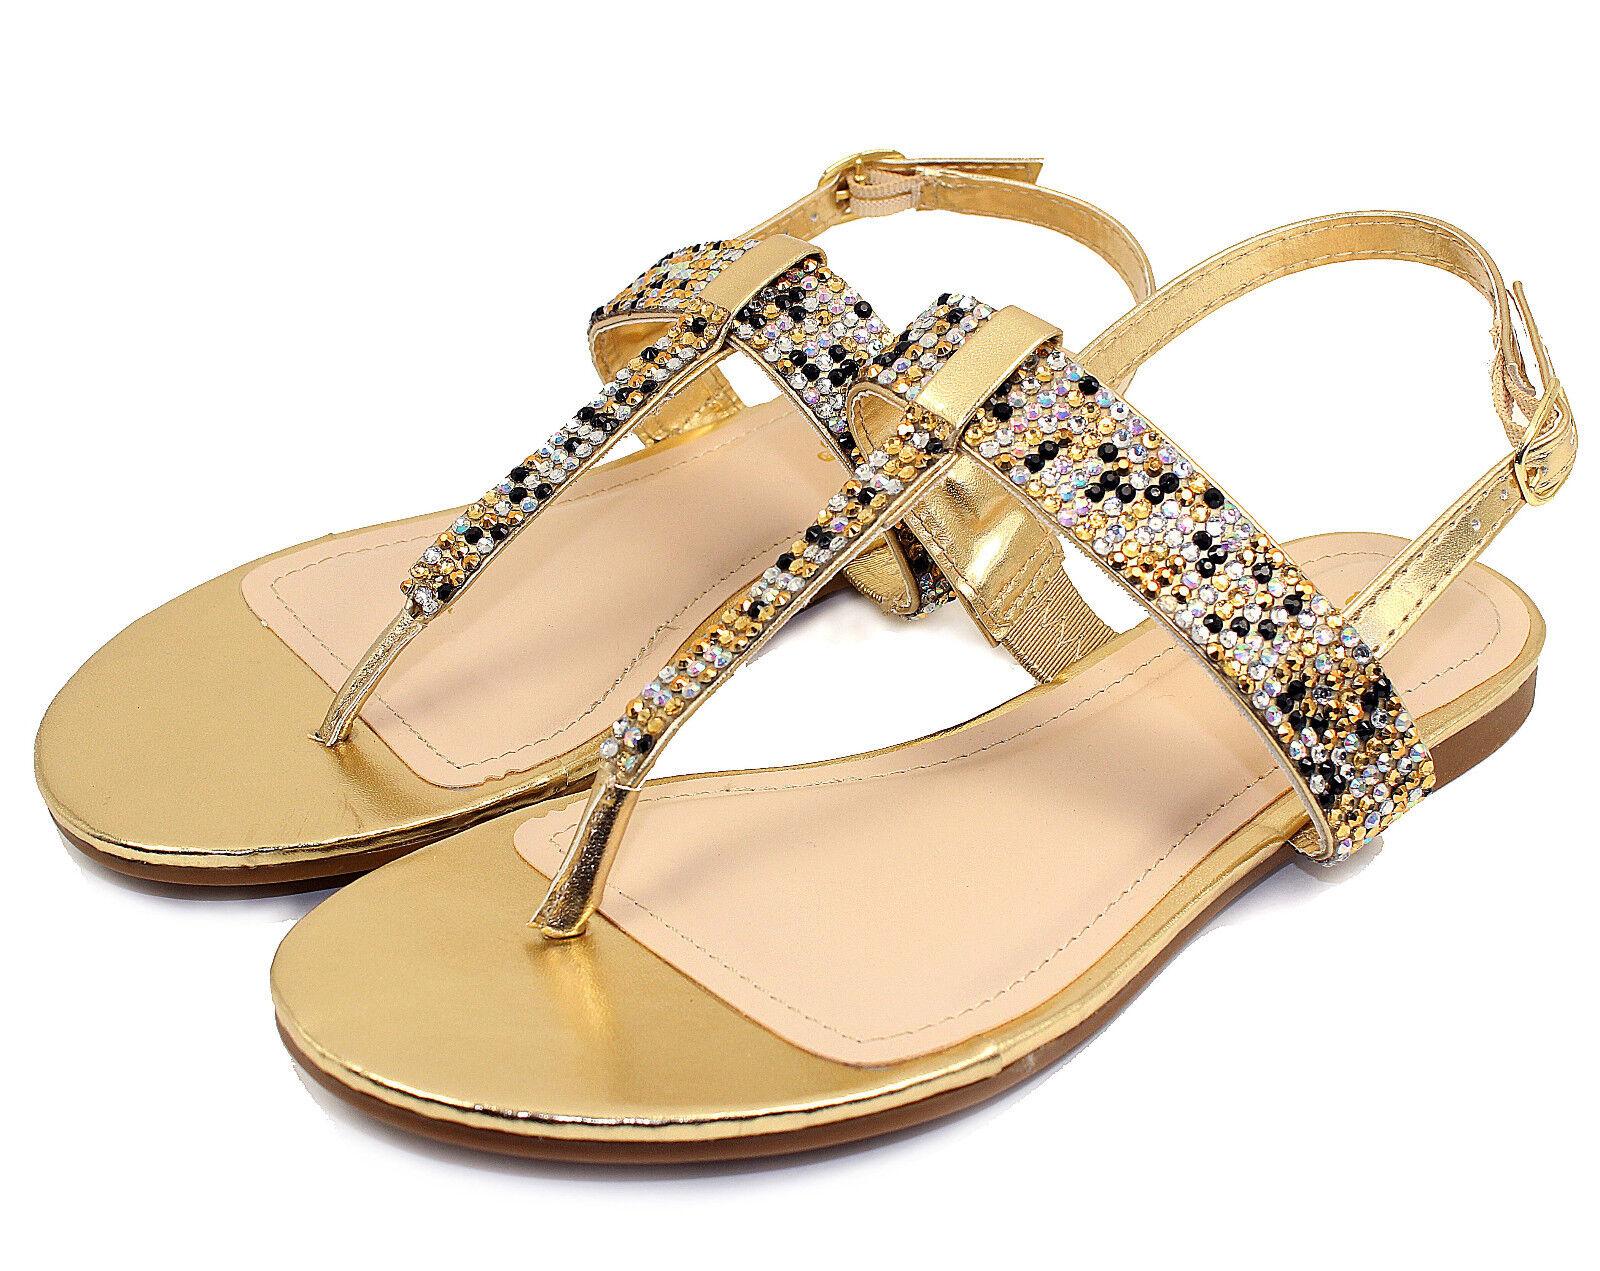 JOSALYN-22 T-Strap Thong Toe Women Gladiator Flats Sandals Bead Women Toe Shoes Gold 6.5 7dfab4